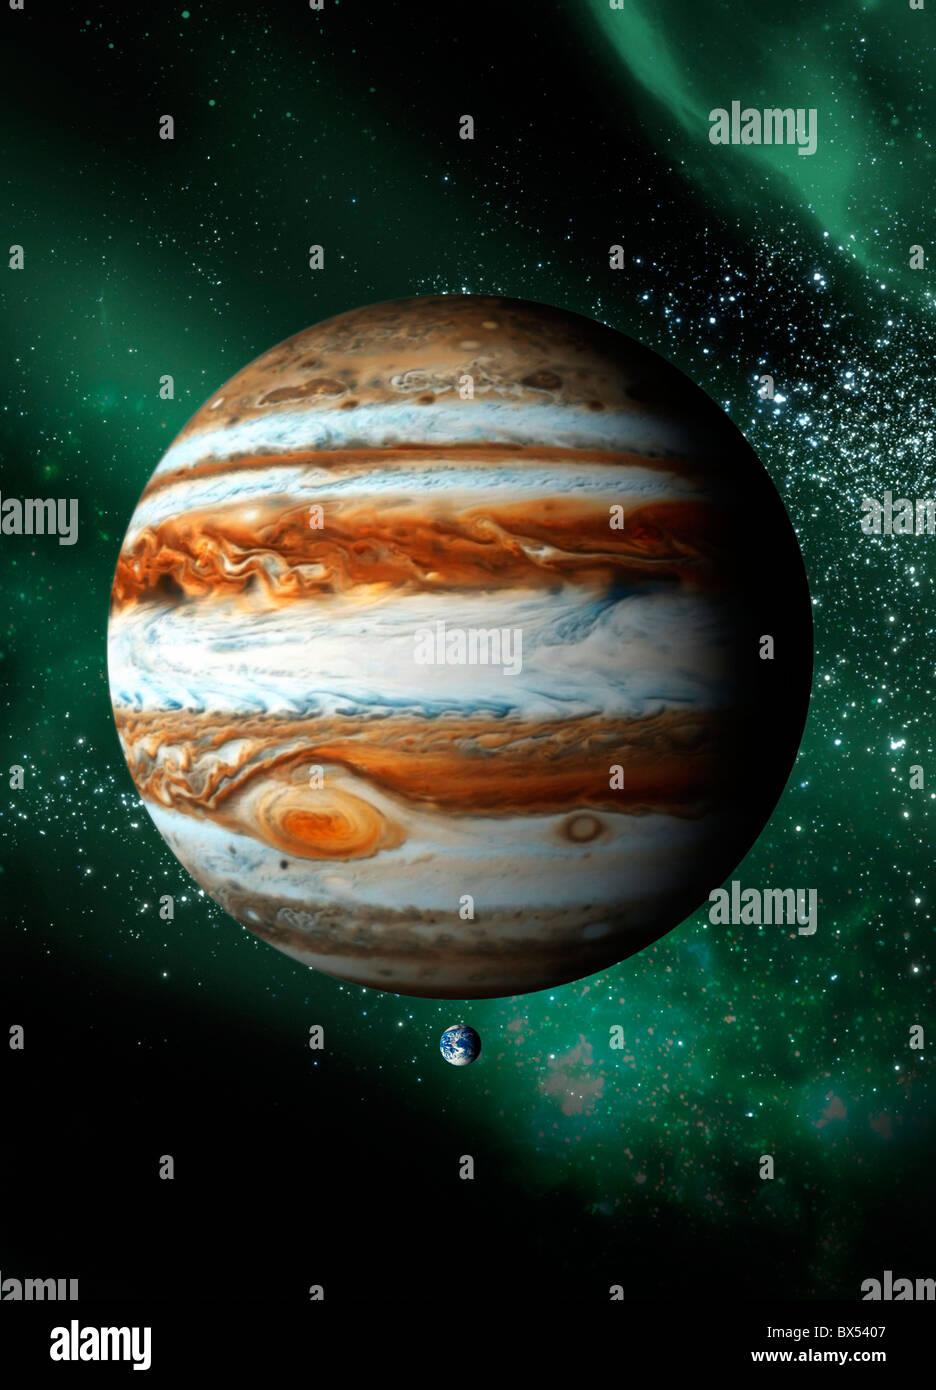 Jupiter and Earth, artwork - Stock Image